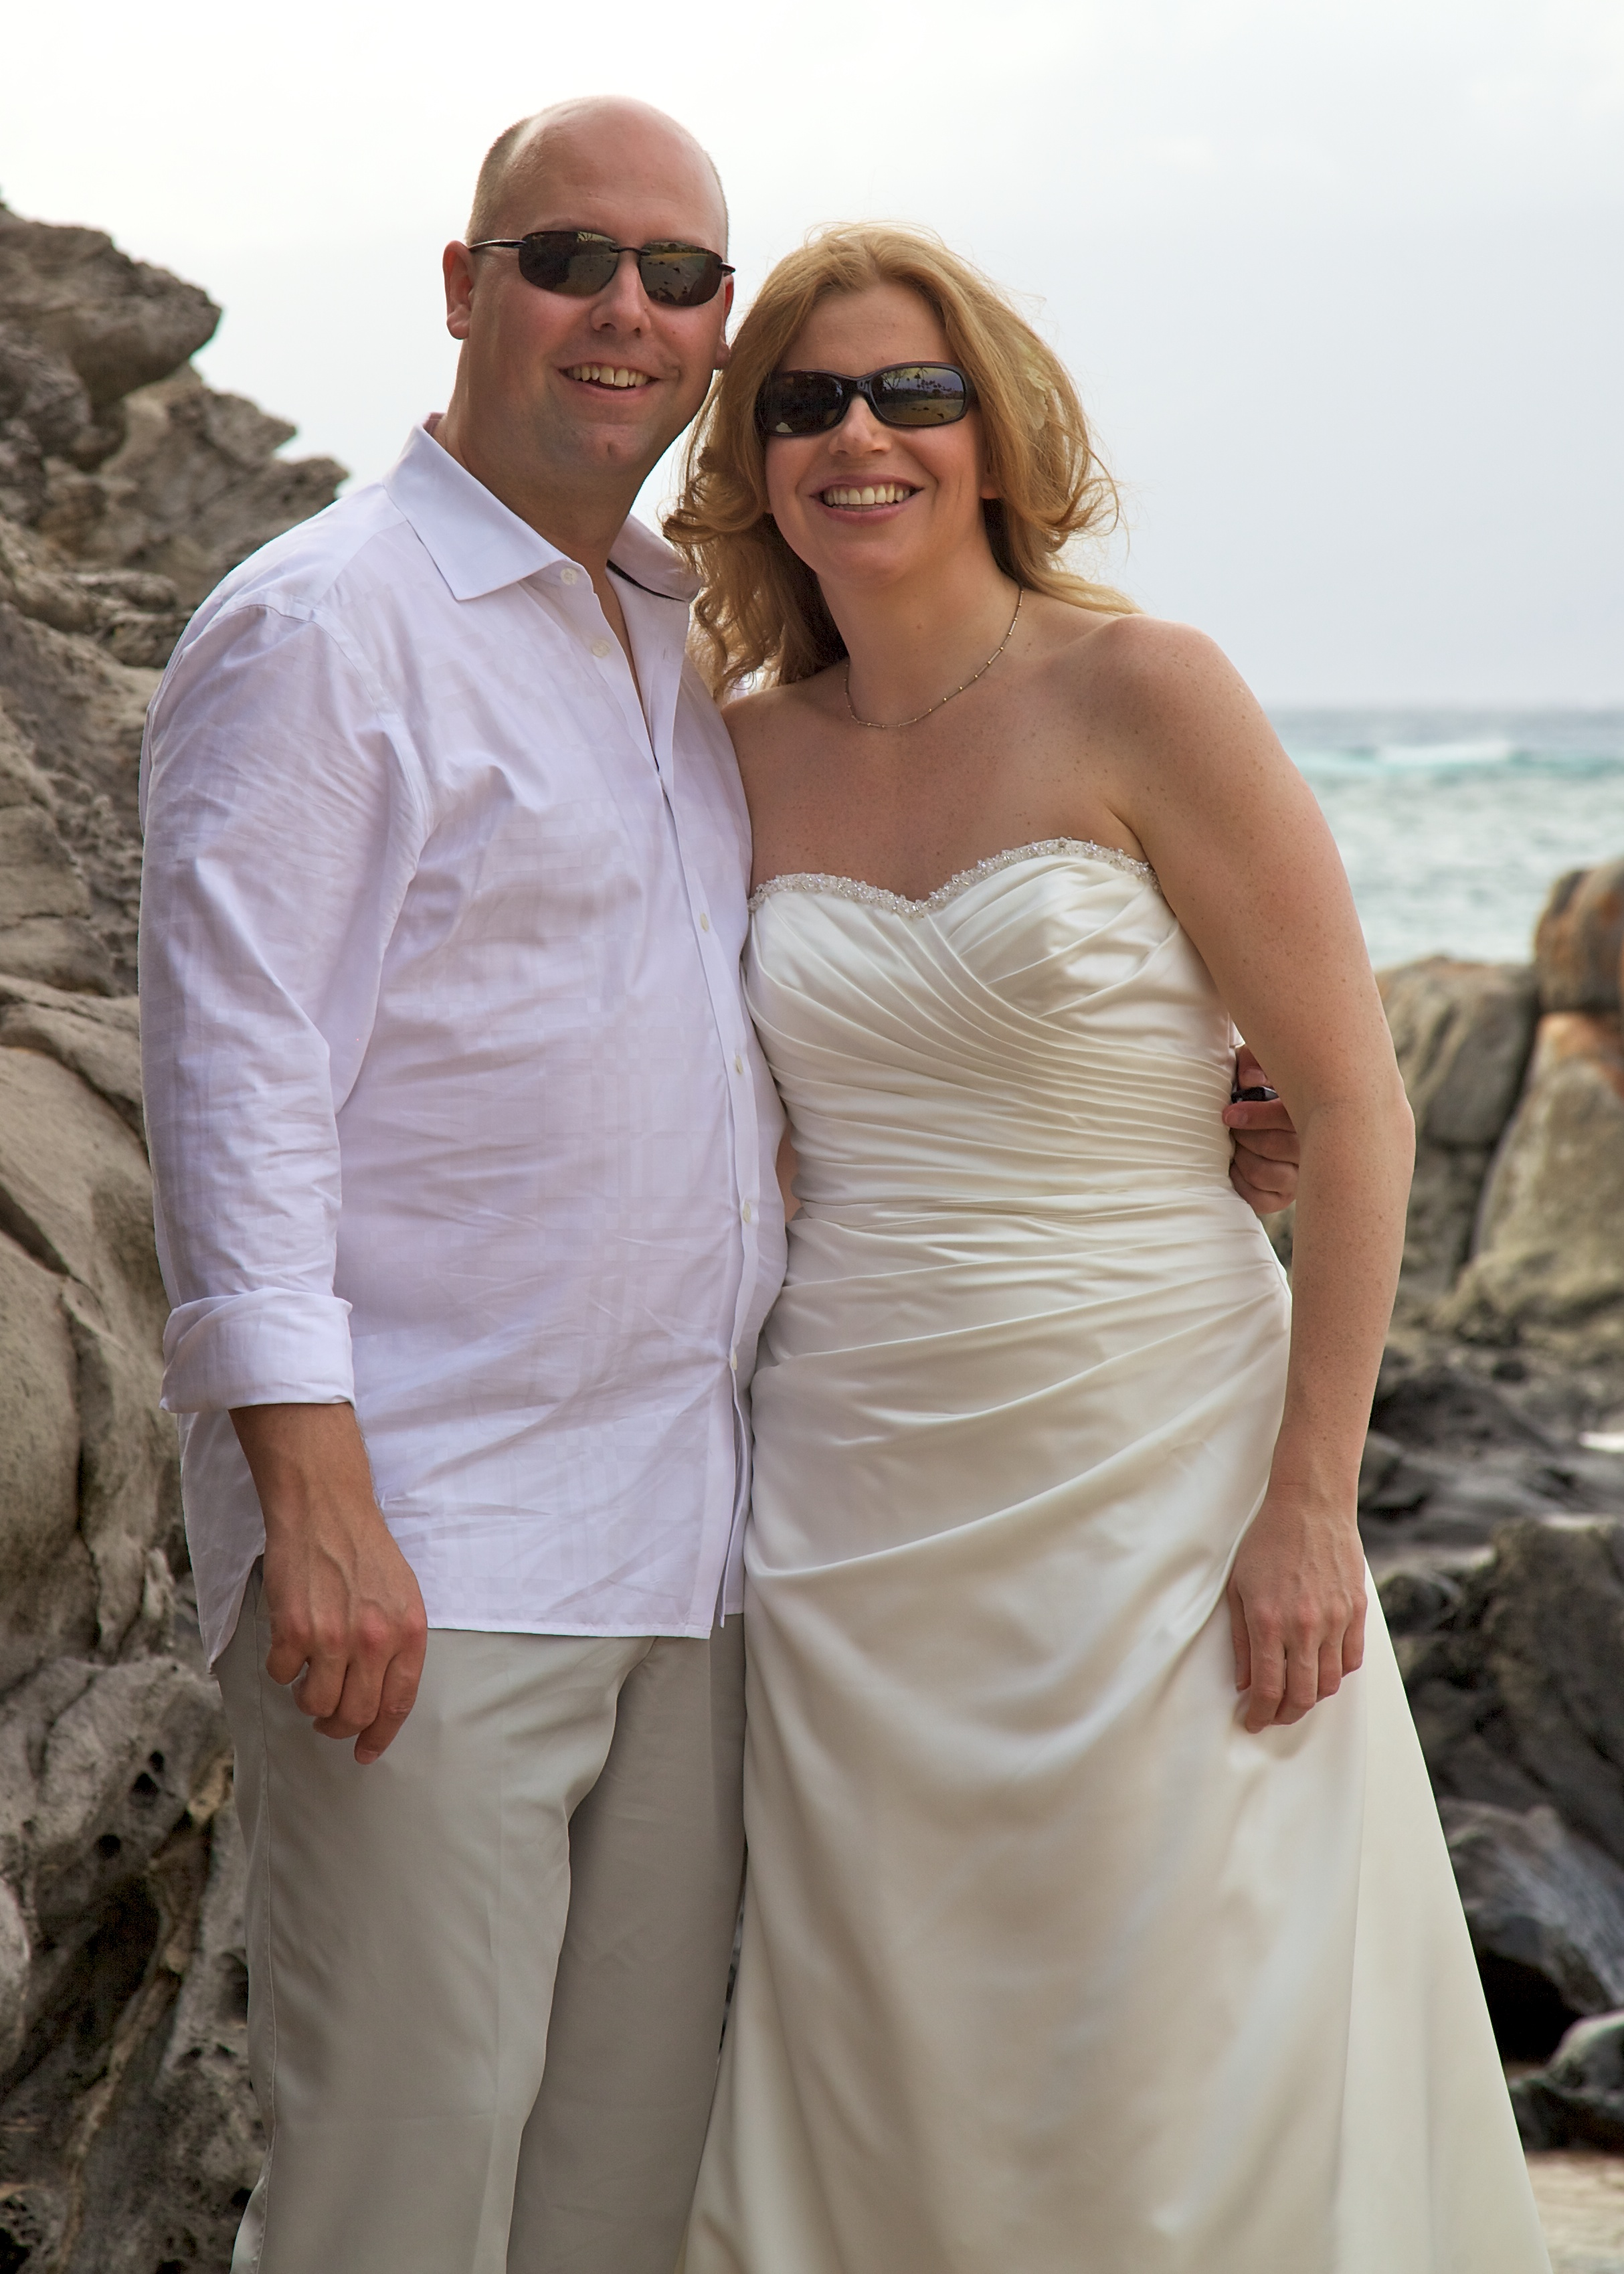 Wedding++28040+%2823+of+50%29-1766416585-O.jpg